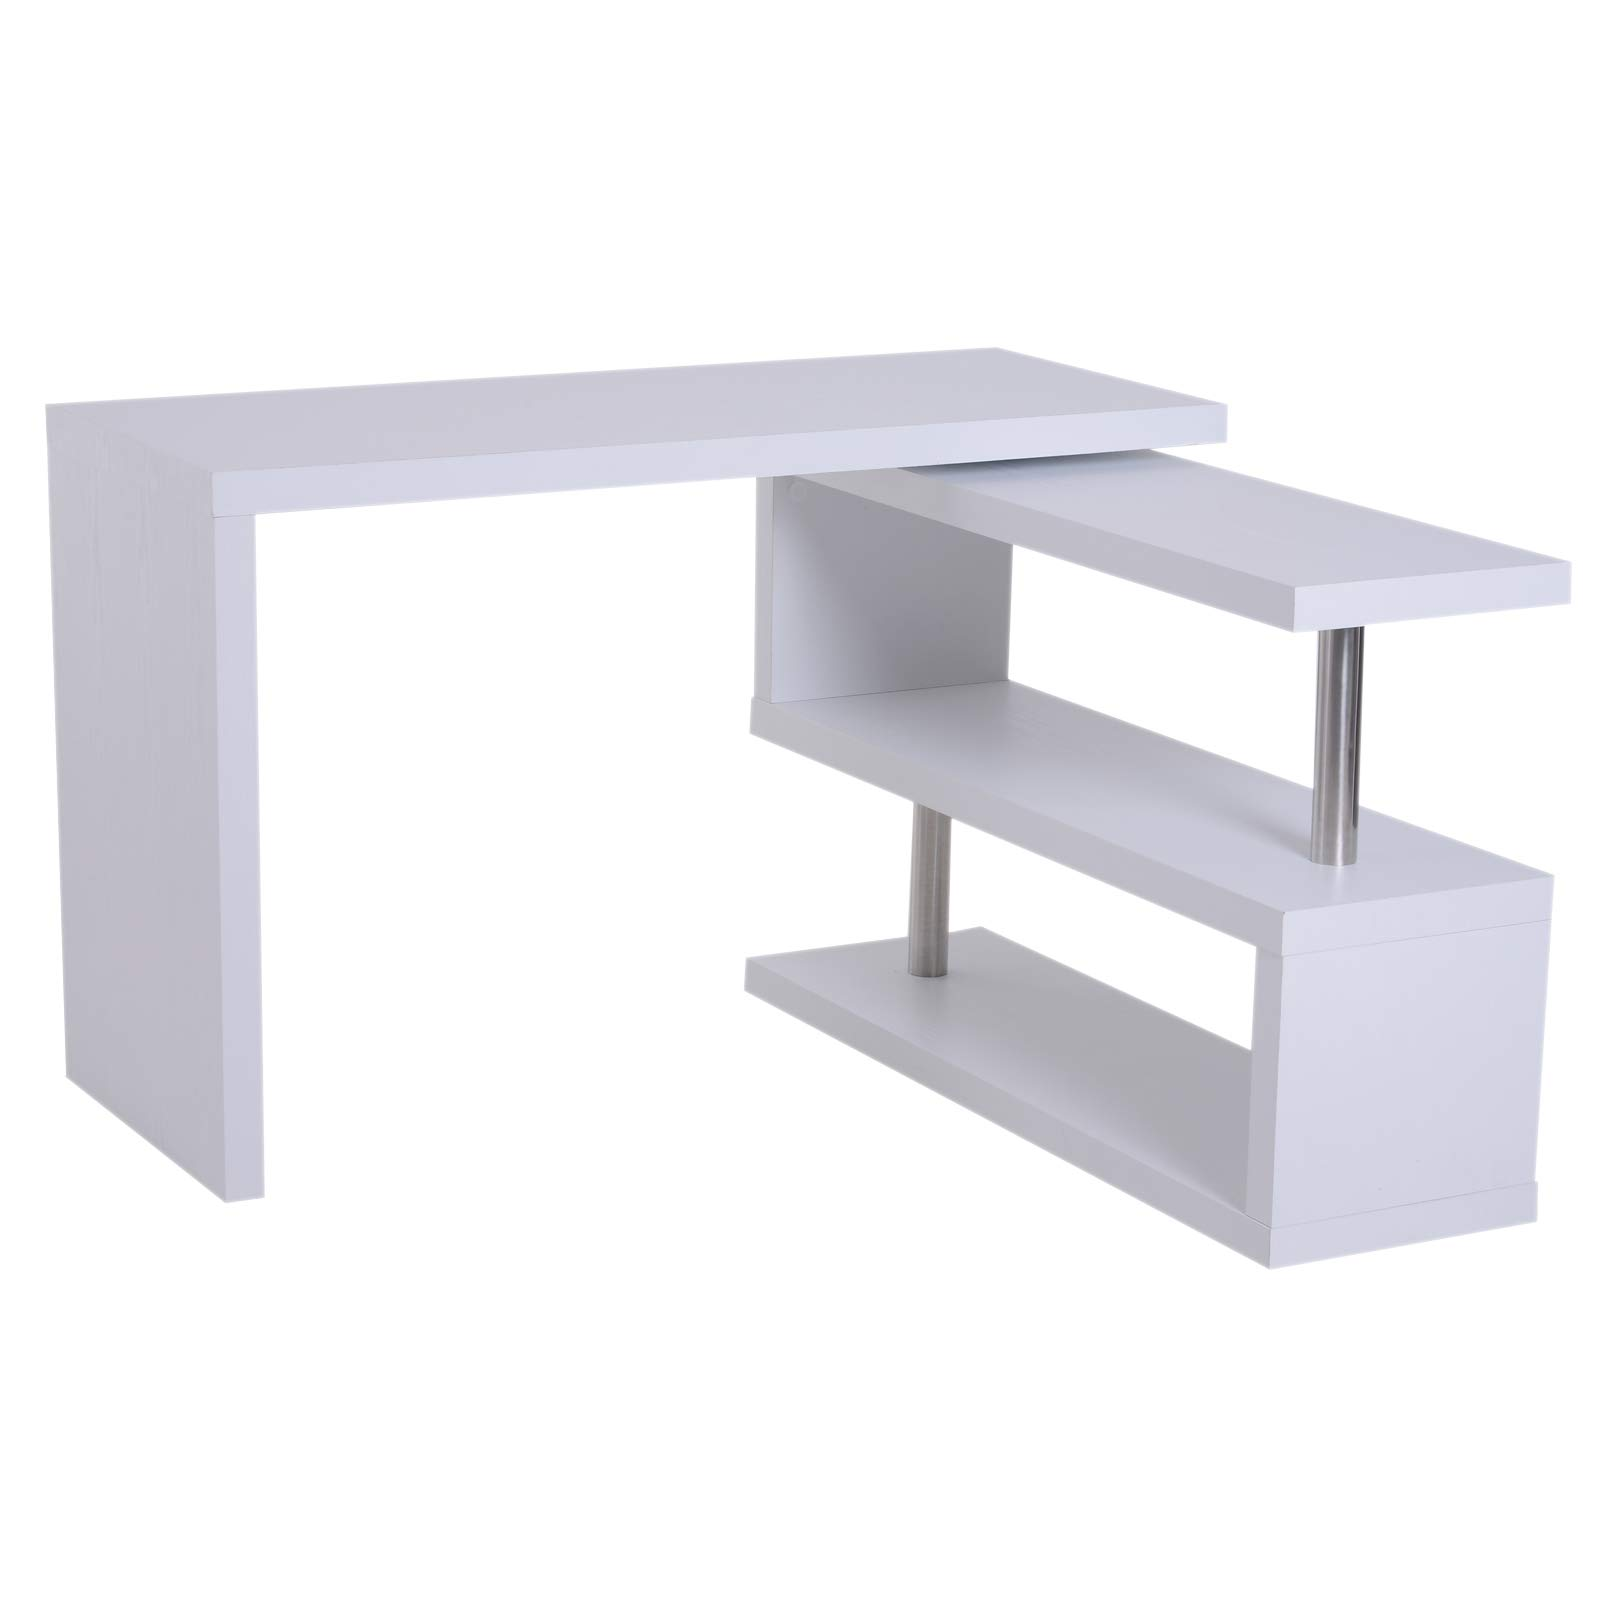 HomCom 75'' 2 Tier L-Shaped Rotating Versatile Computer Desk With Shelves And Steel Frame - White by HOMCOM